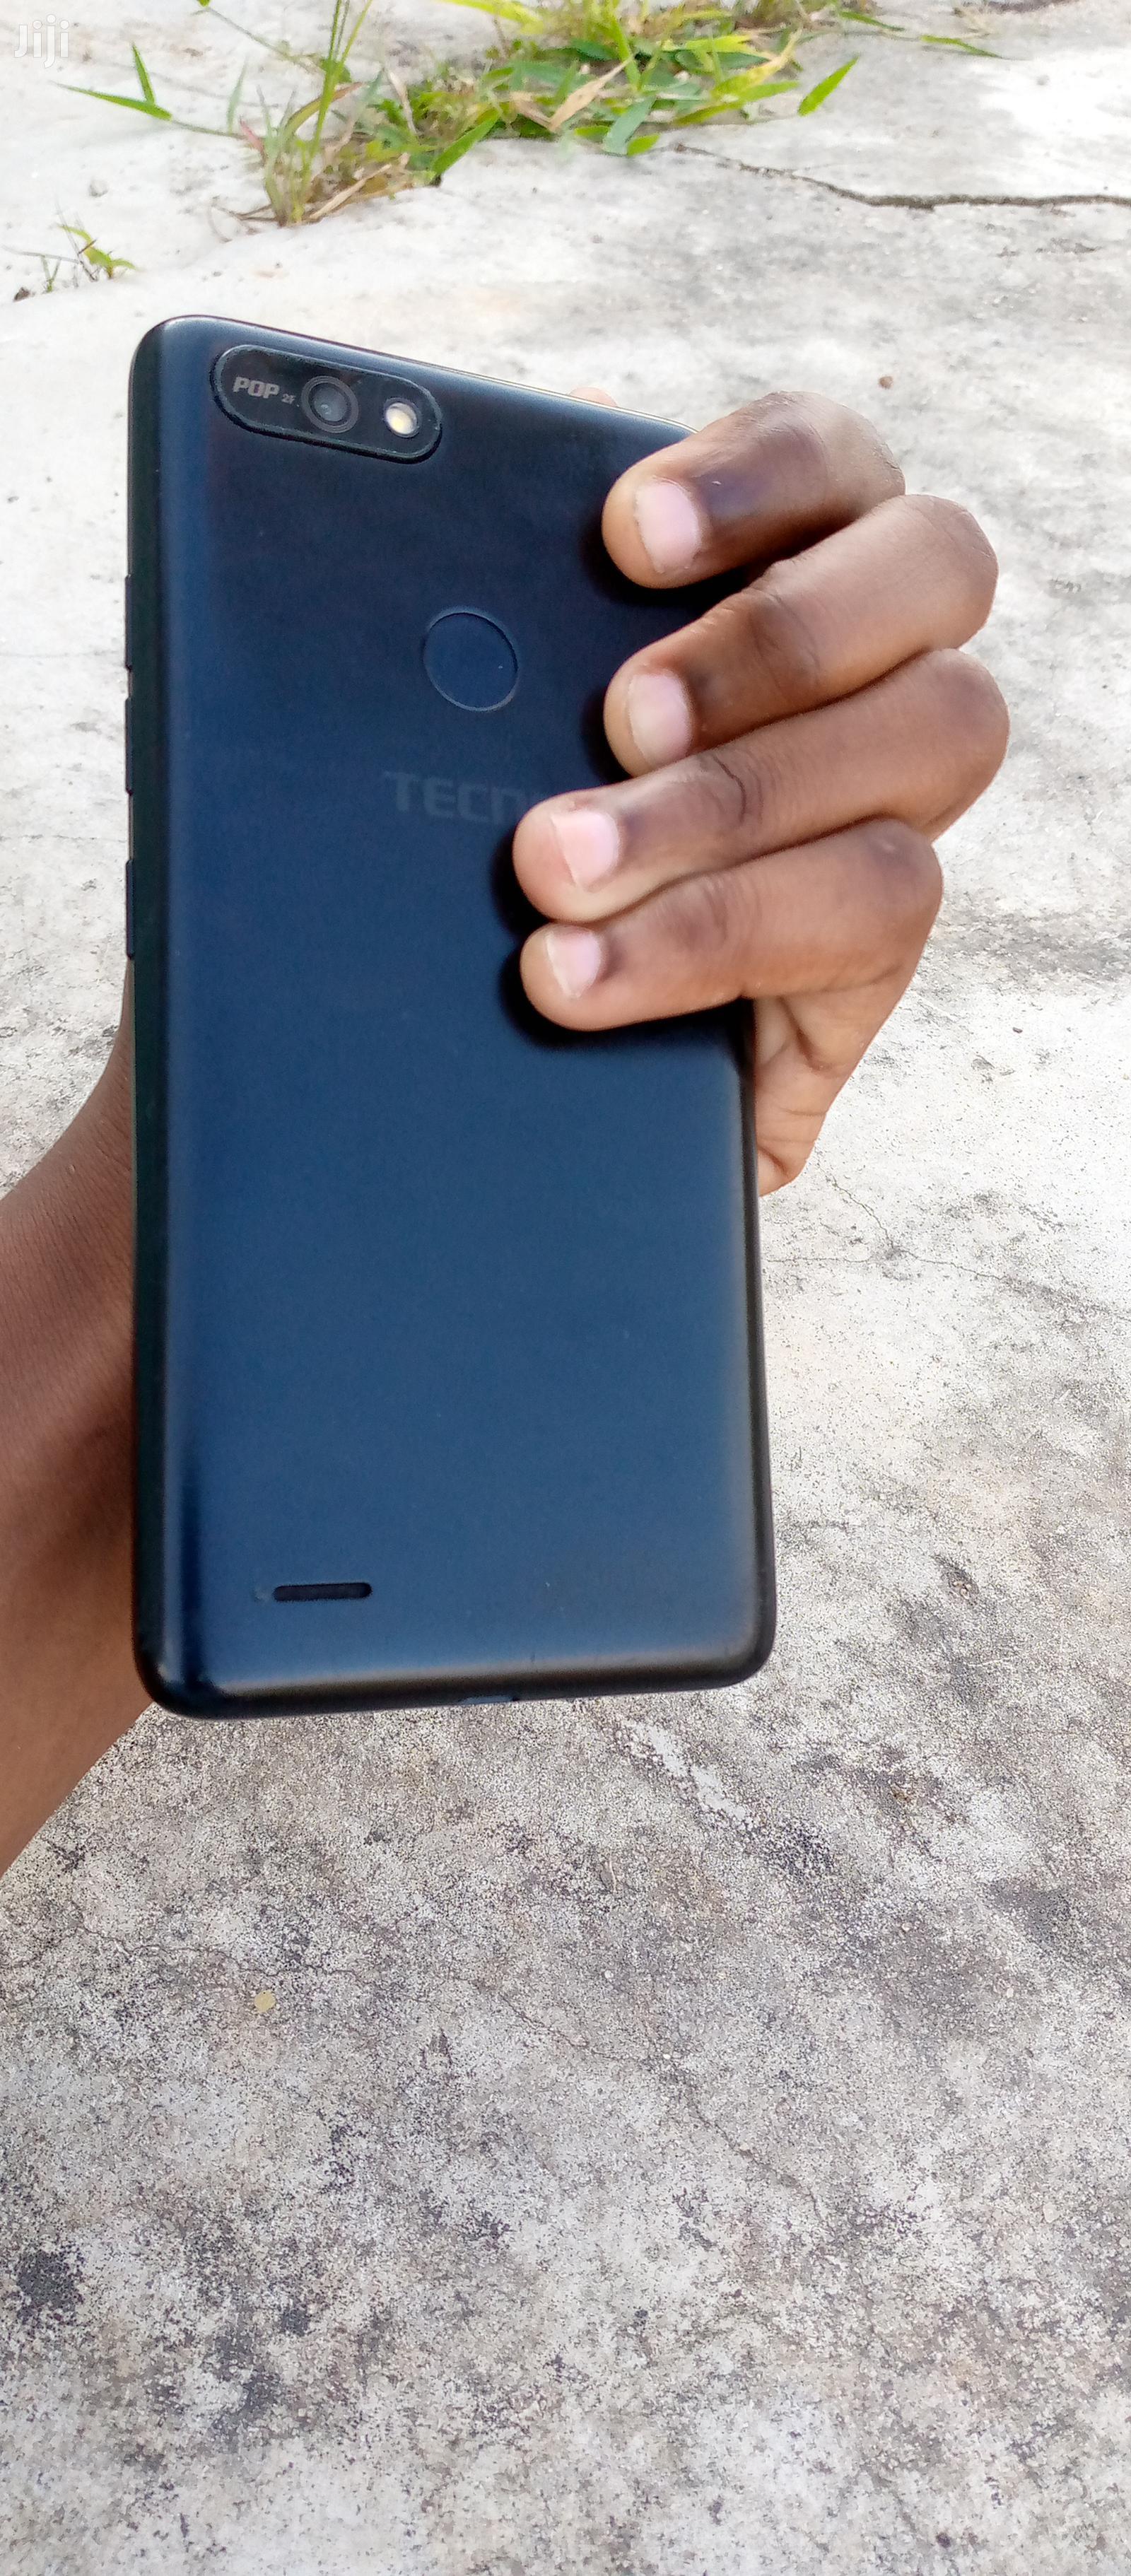 Archive: Tecno Pop 2F 16 GB Black